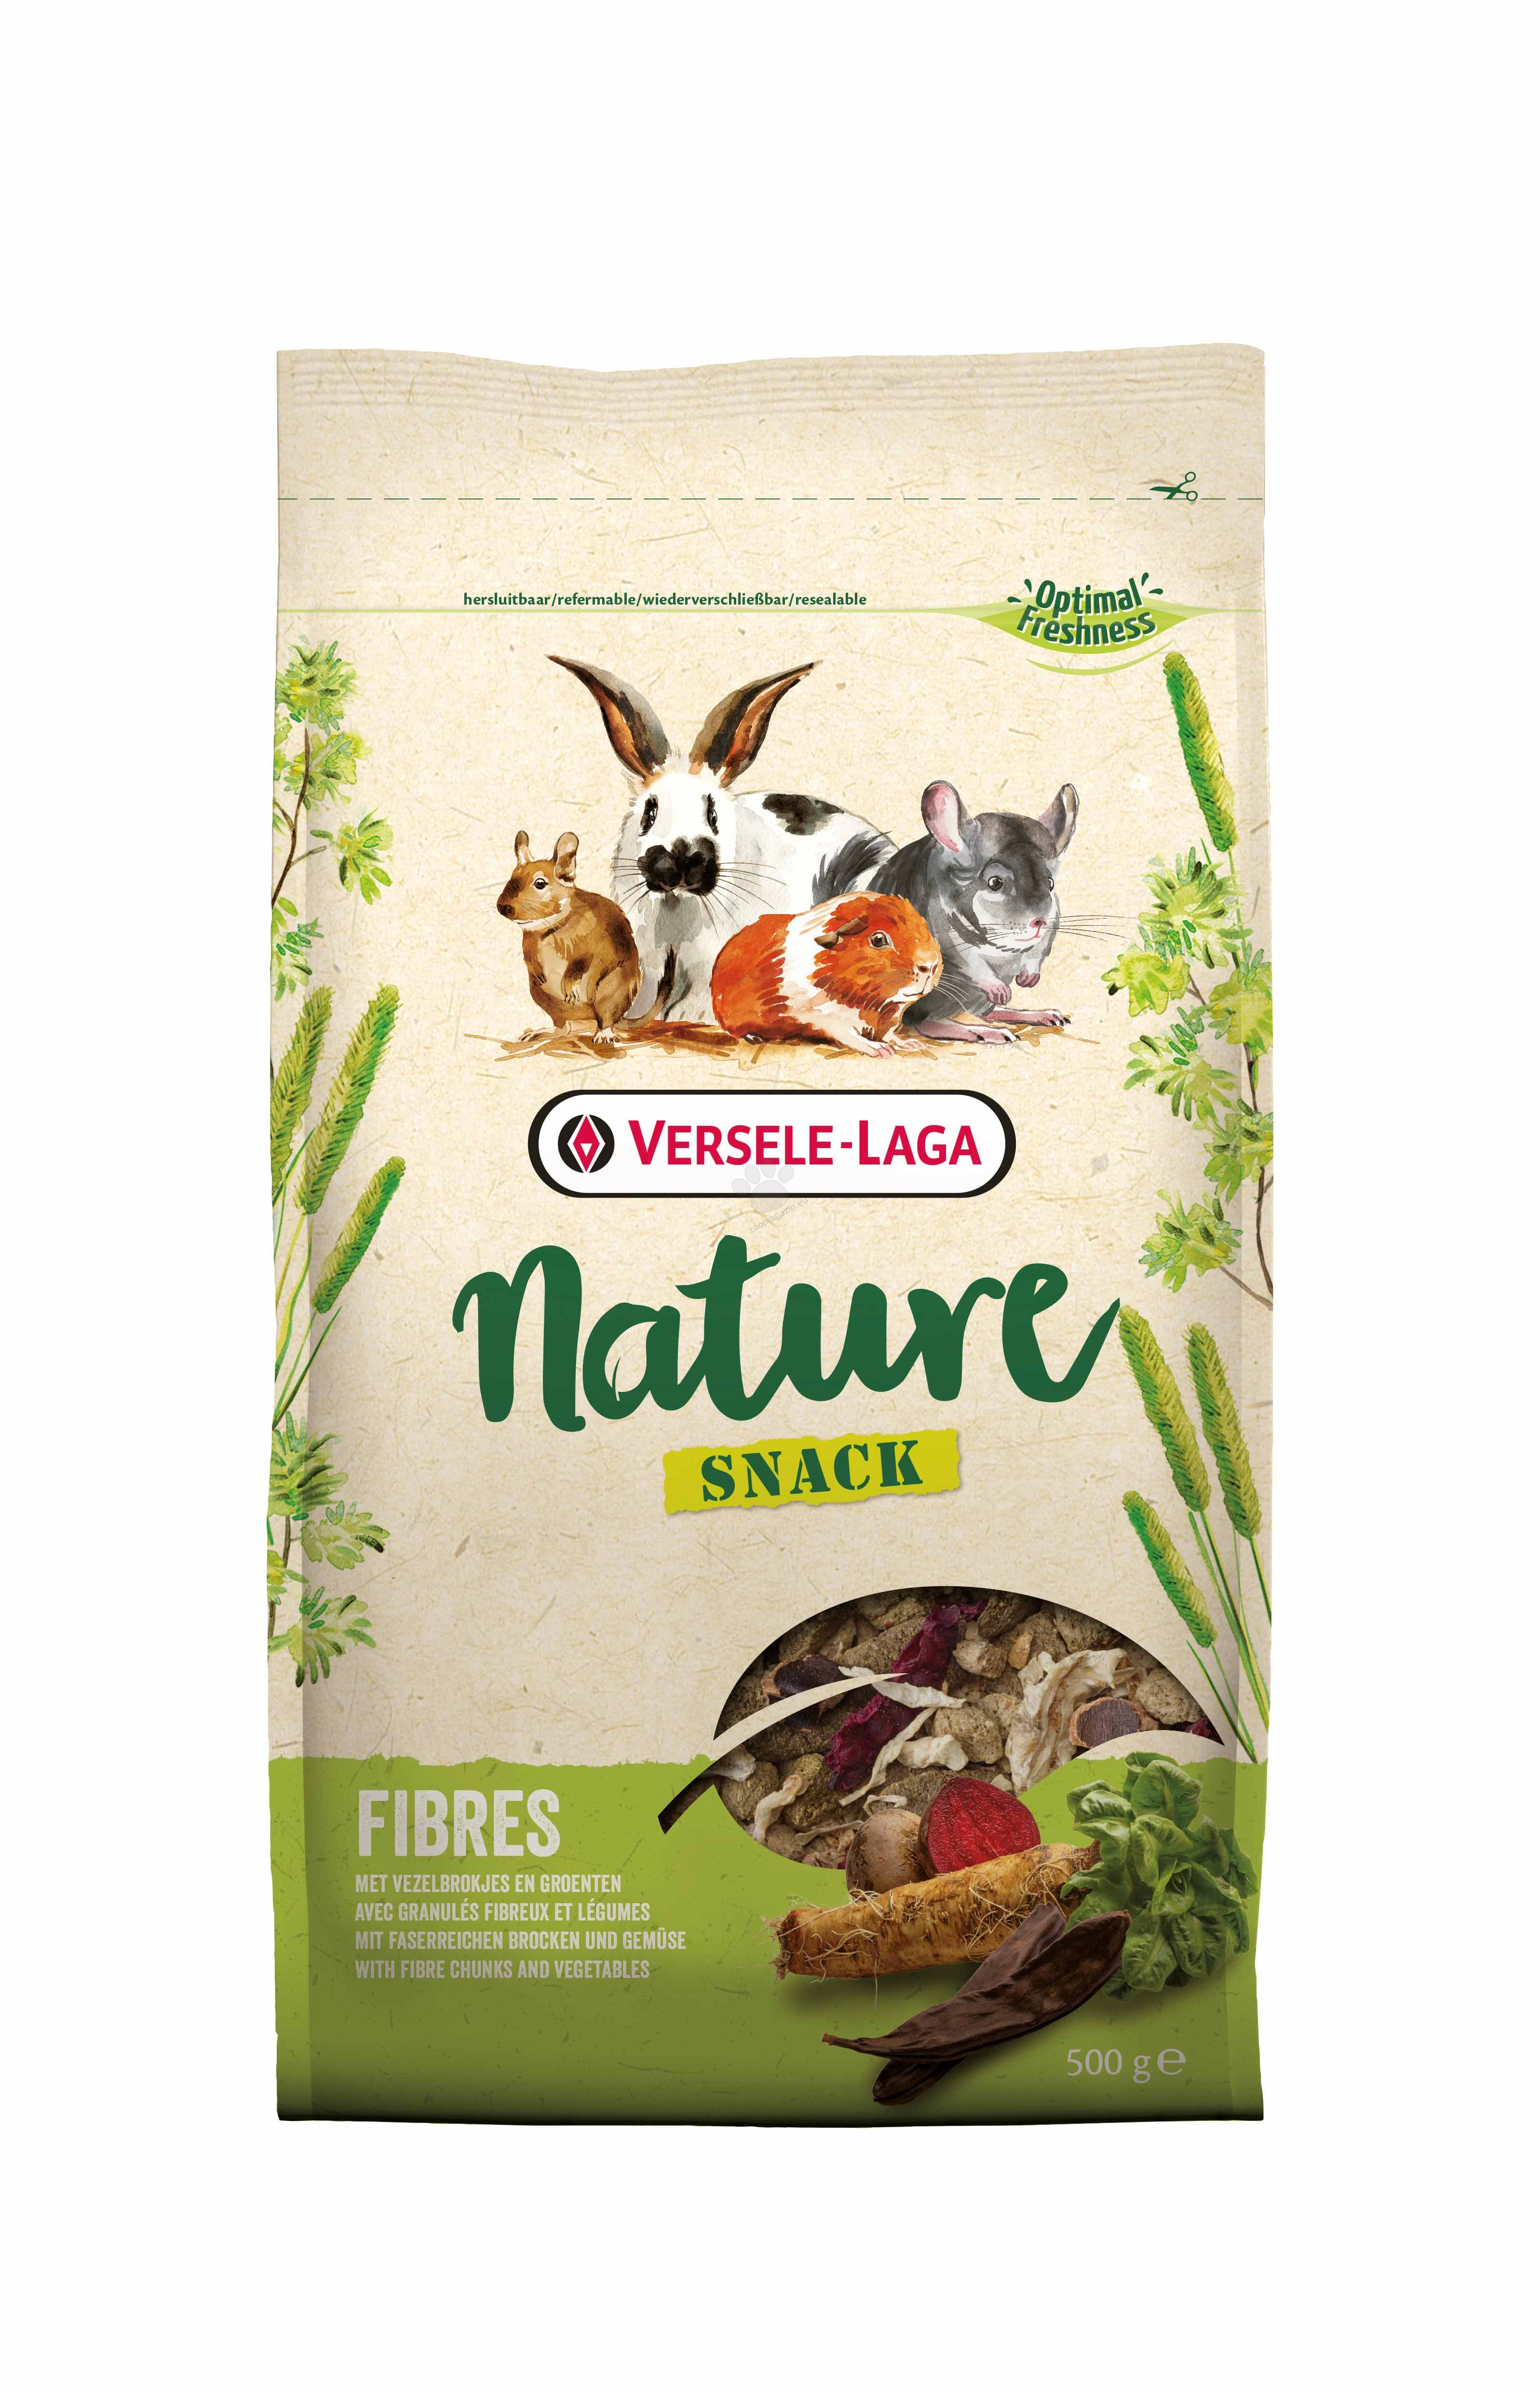 Versele Laga - Nature Snack Fibers - разнообразна фибри закуска 500 гр.